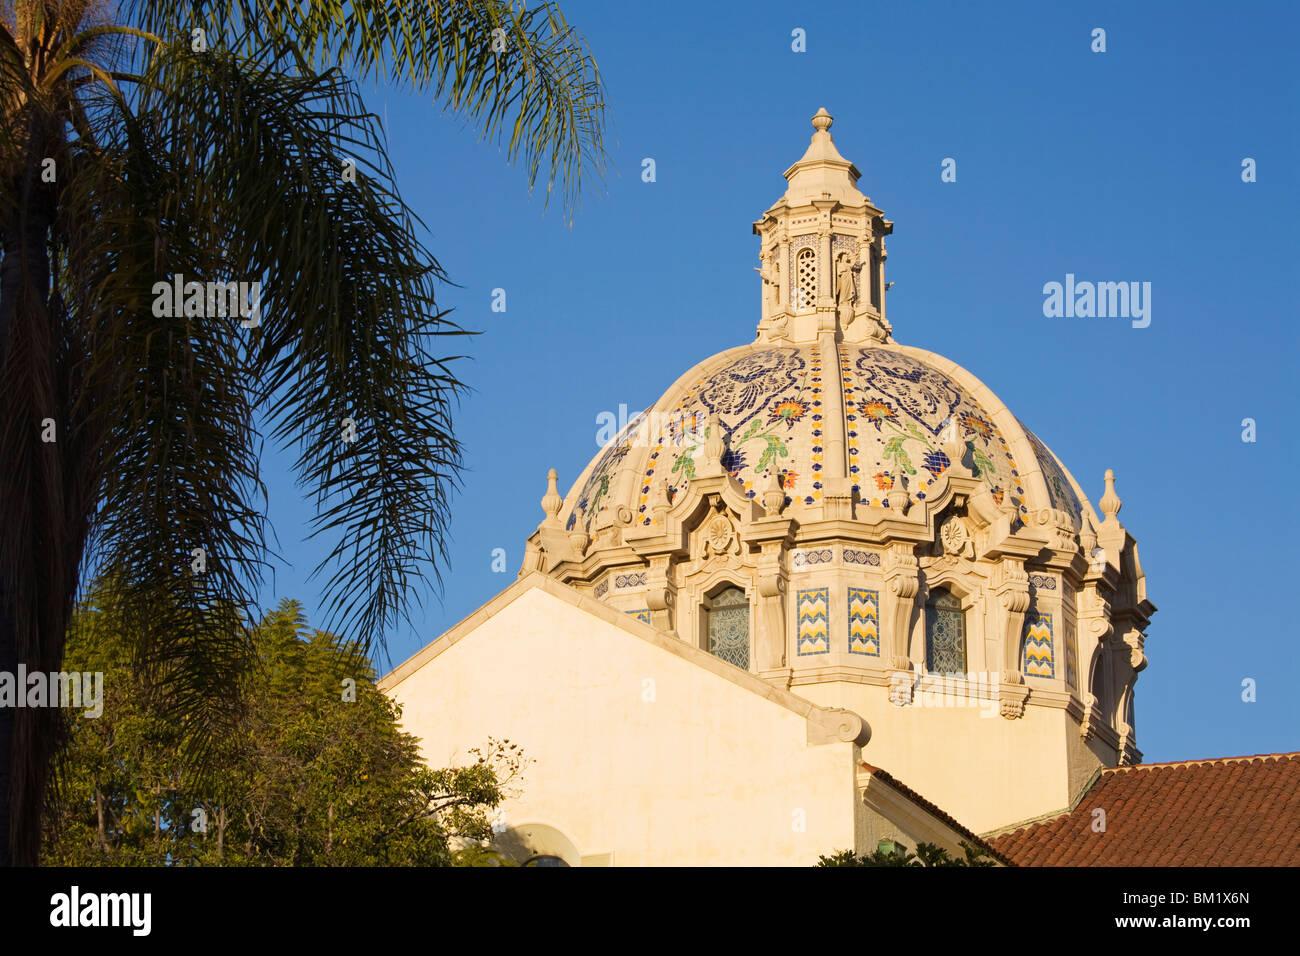 St. Vincent de Paul Catholic church, Figueroa Street, Los Angeles, California, United States of America, North America - Stock Image